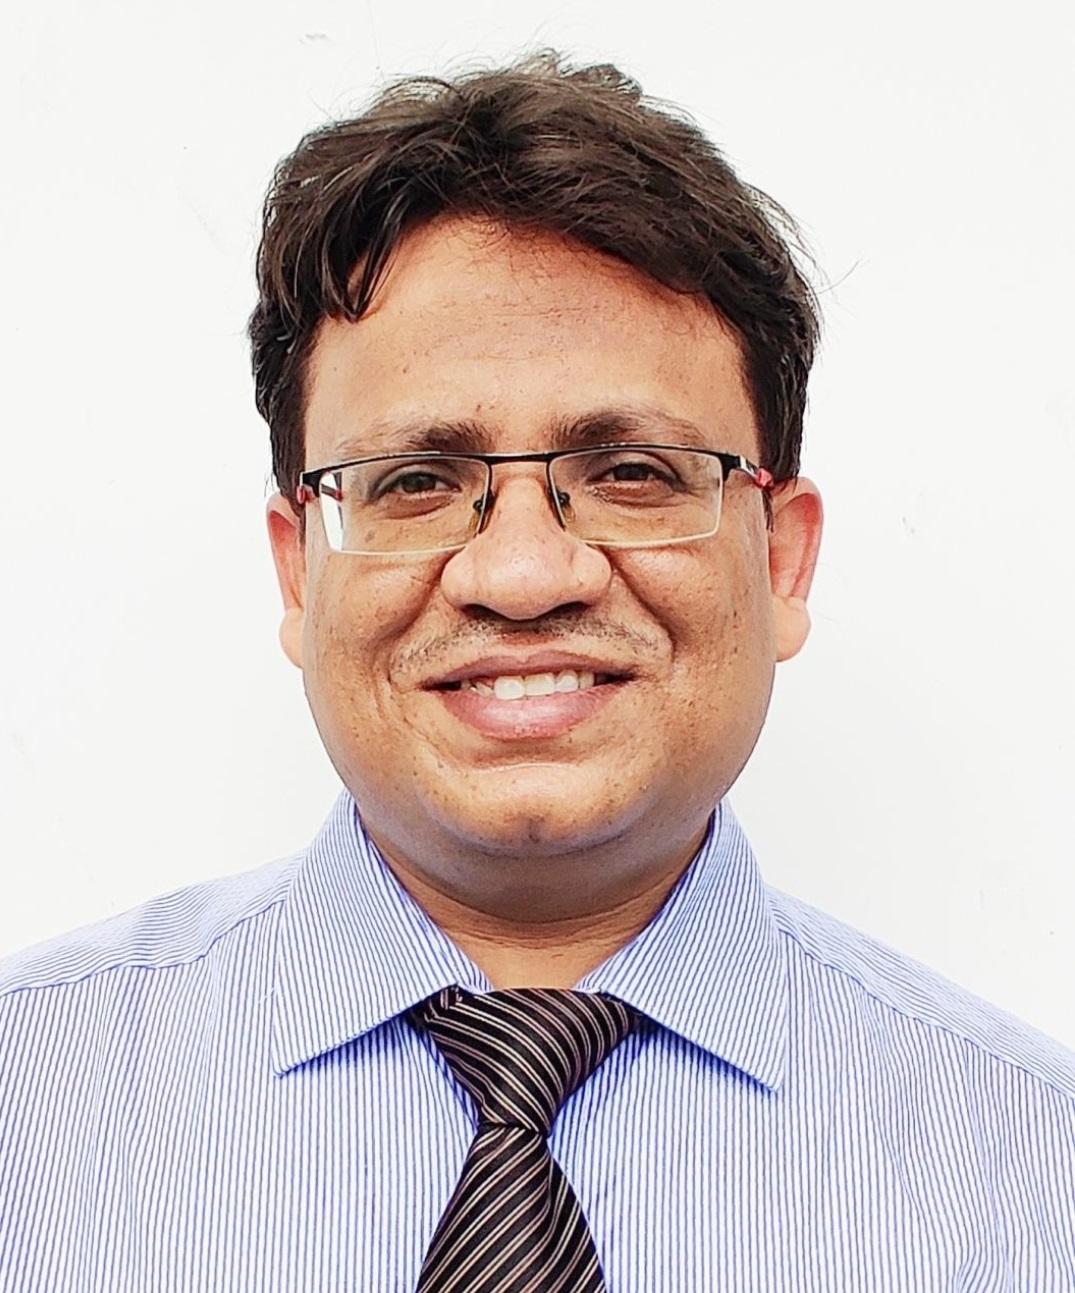 Prof. Ashutosh Pandey